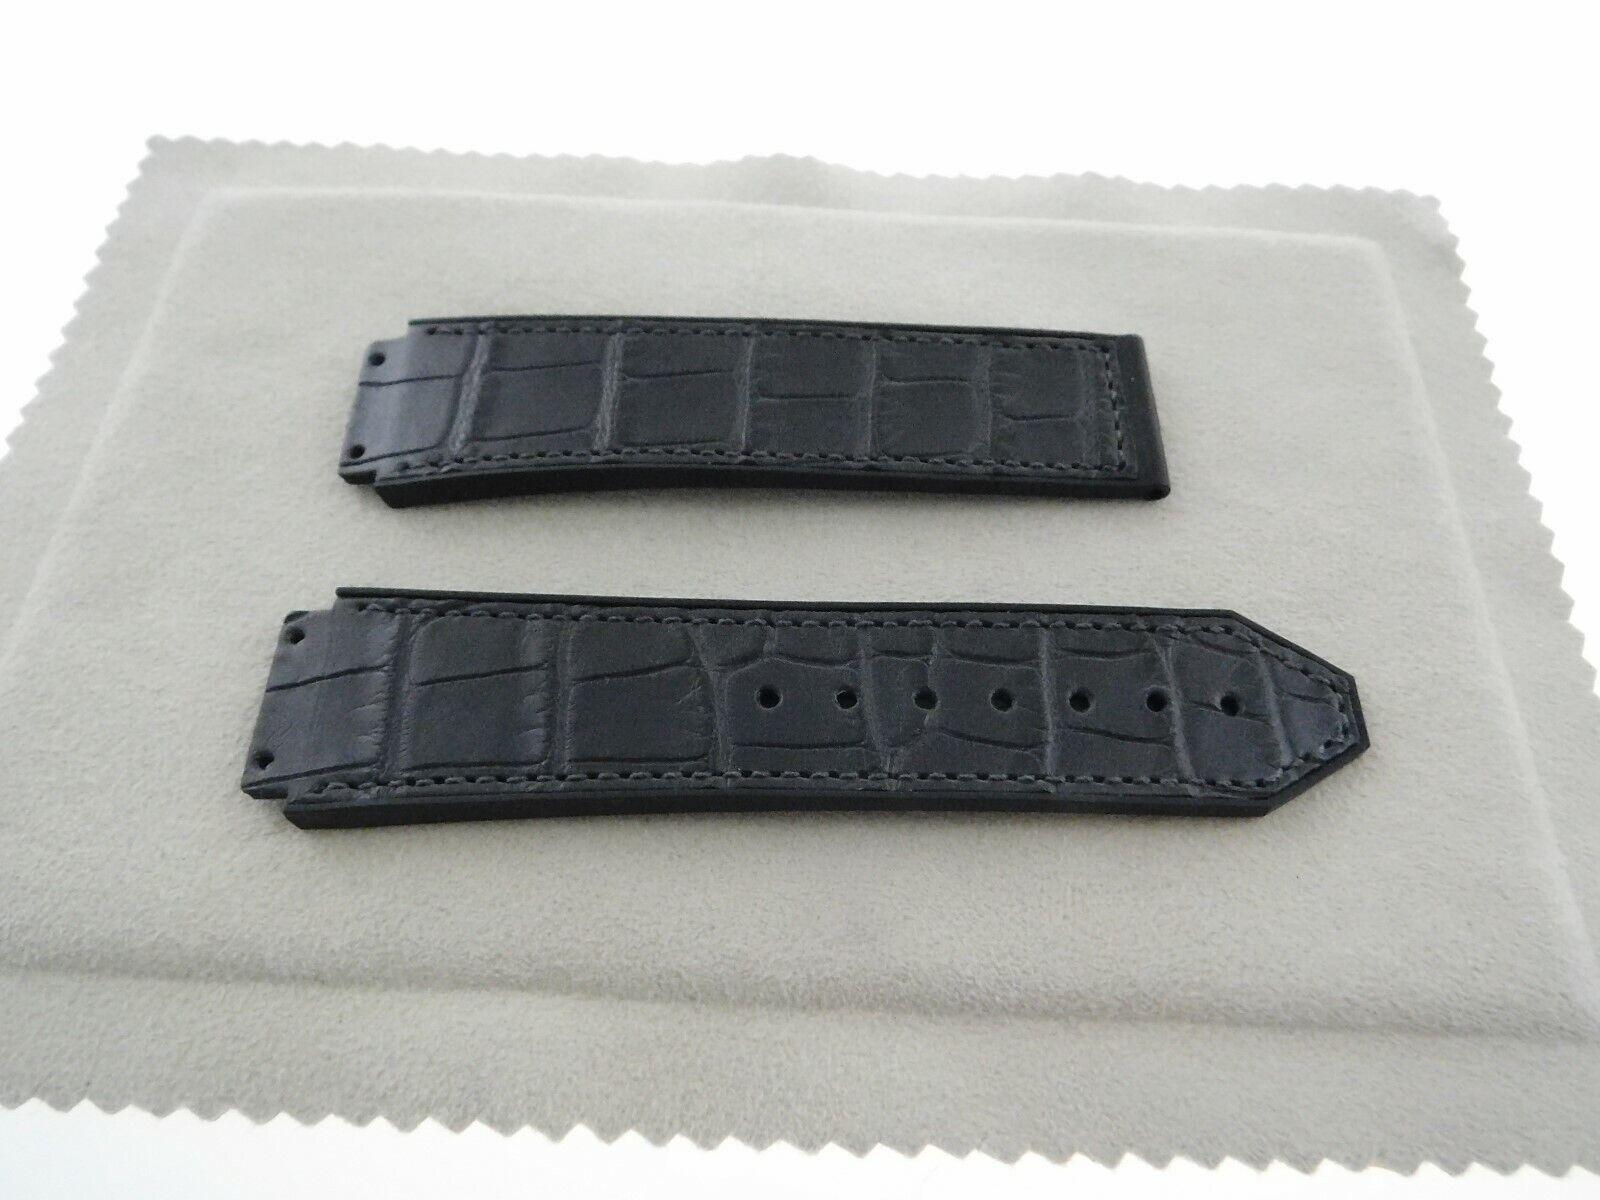 Hublot 22,5 - 20 mm Krokoband für Faltschließe Big Bang Uhr Modelle Neu